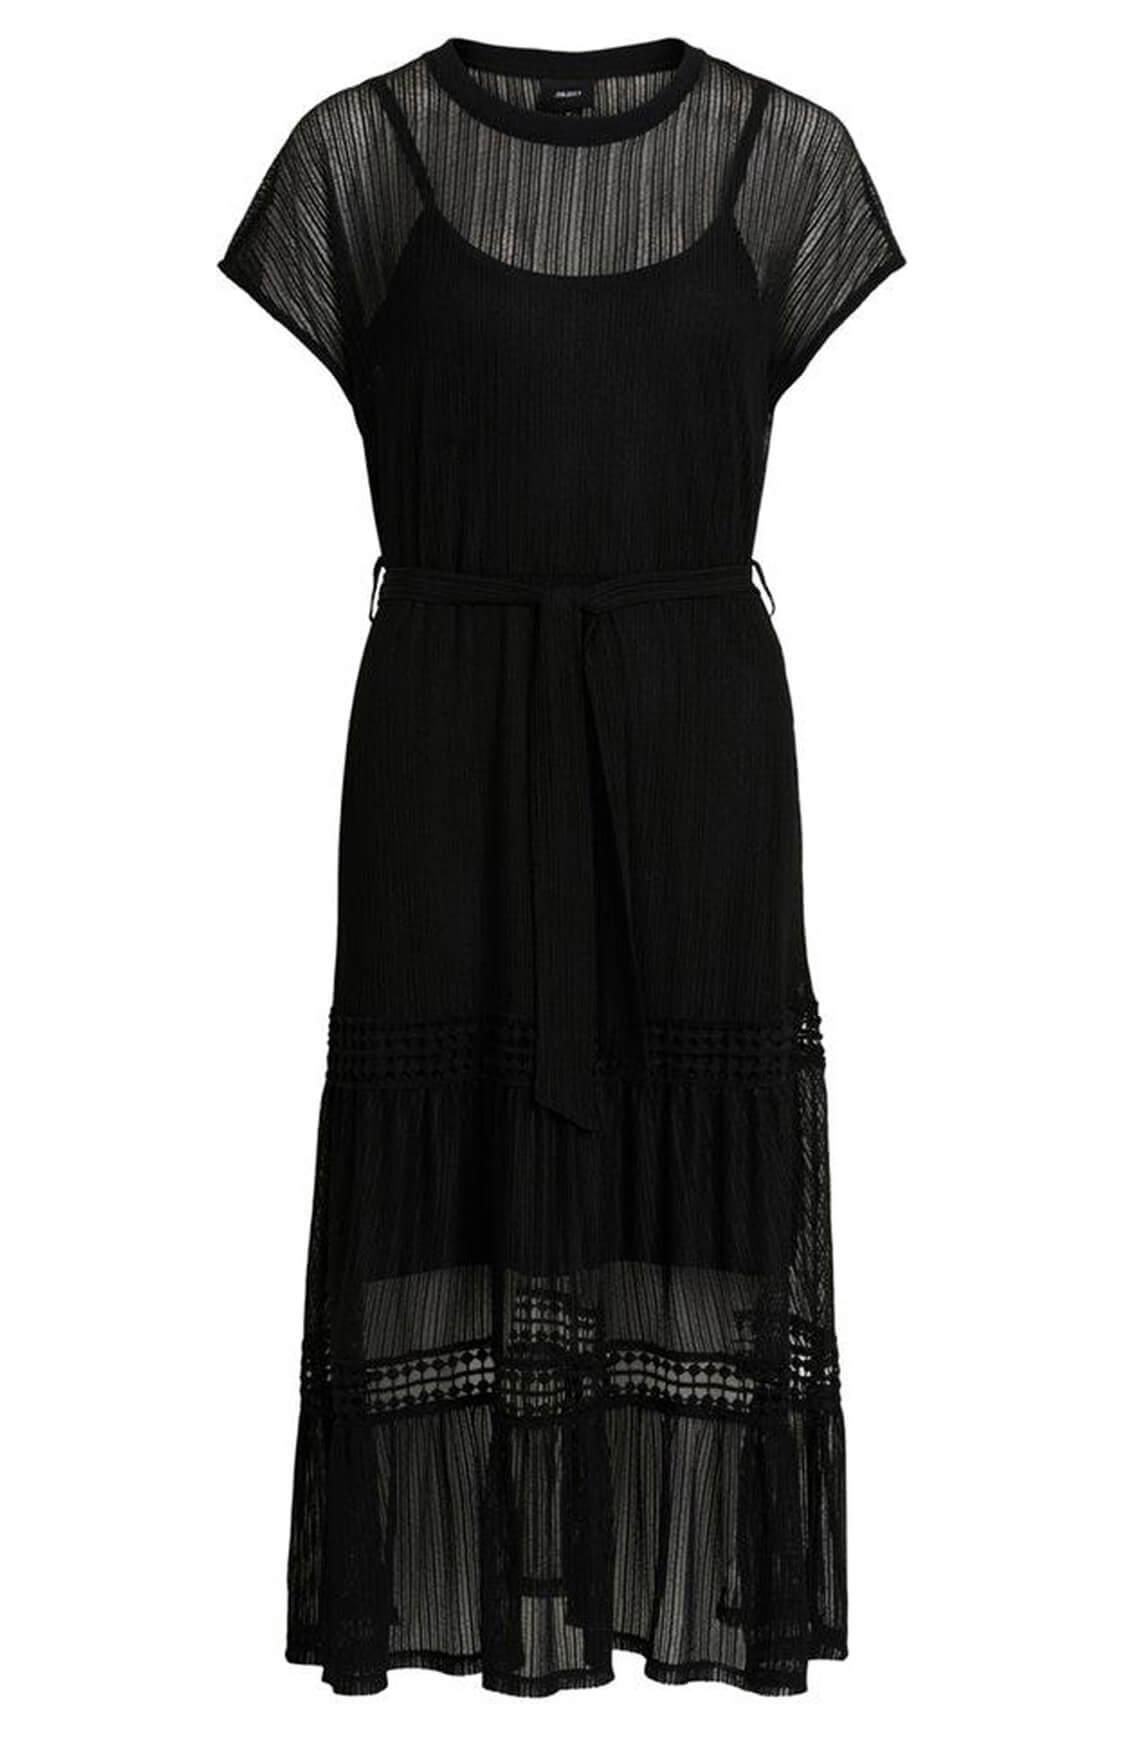 Object Dames Tutsie mesh jurk zwart